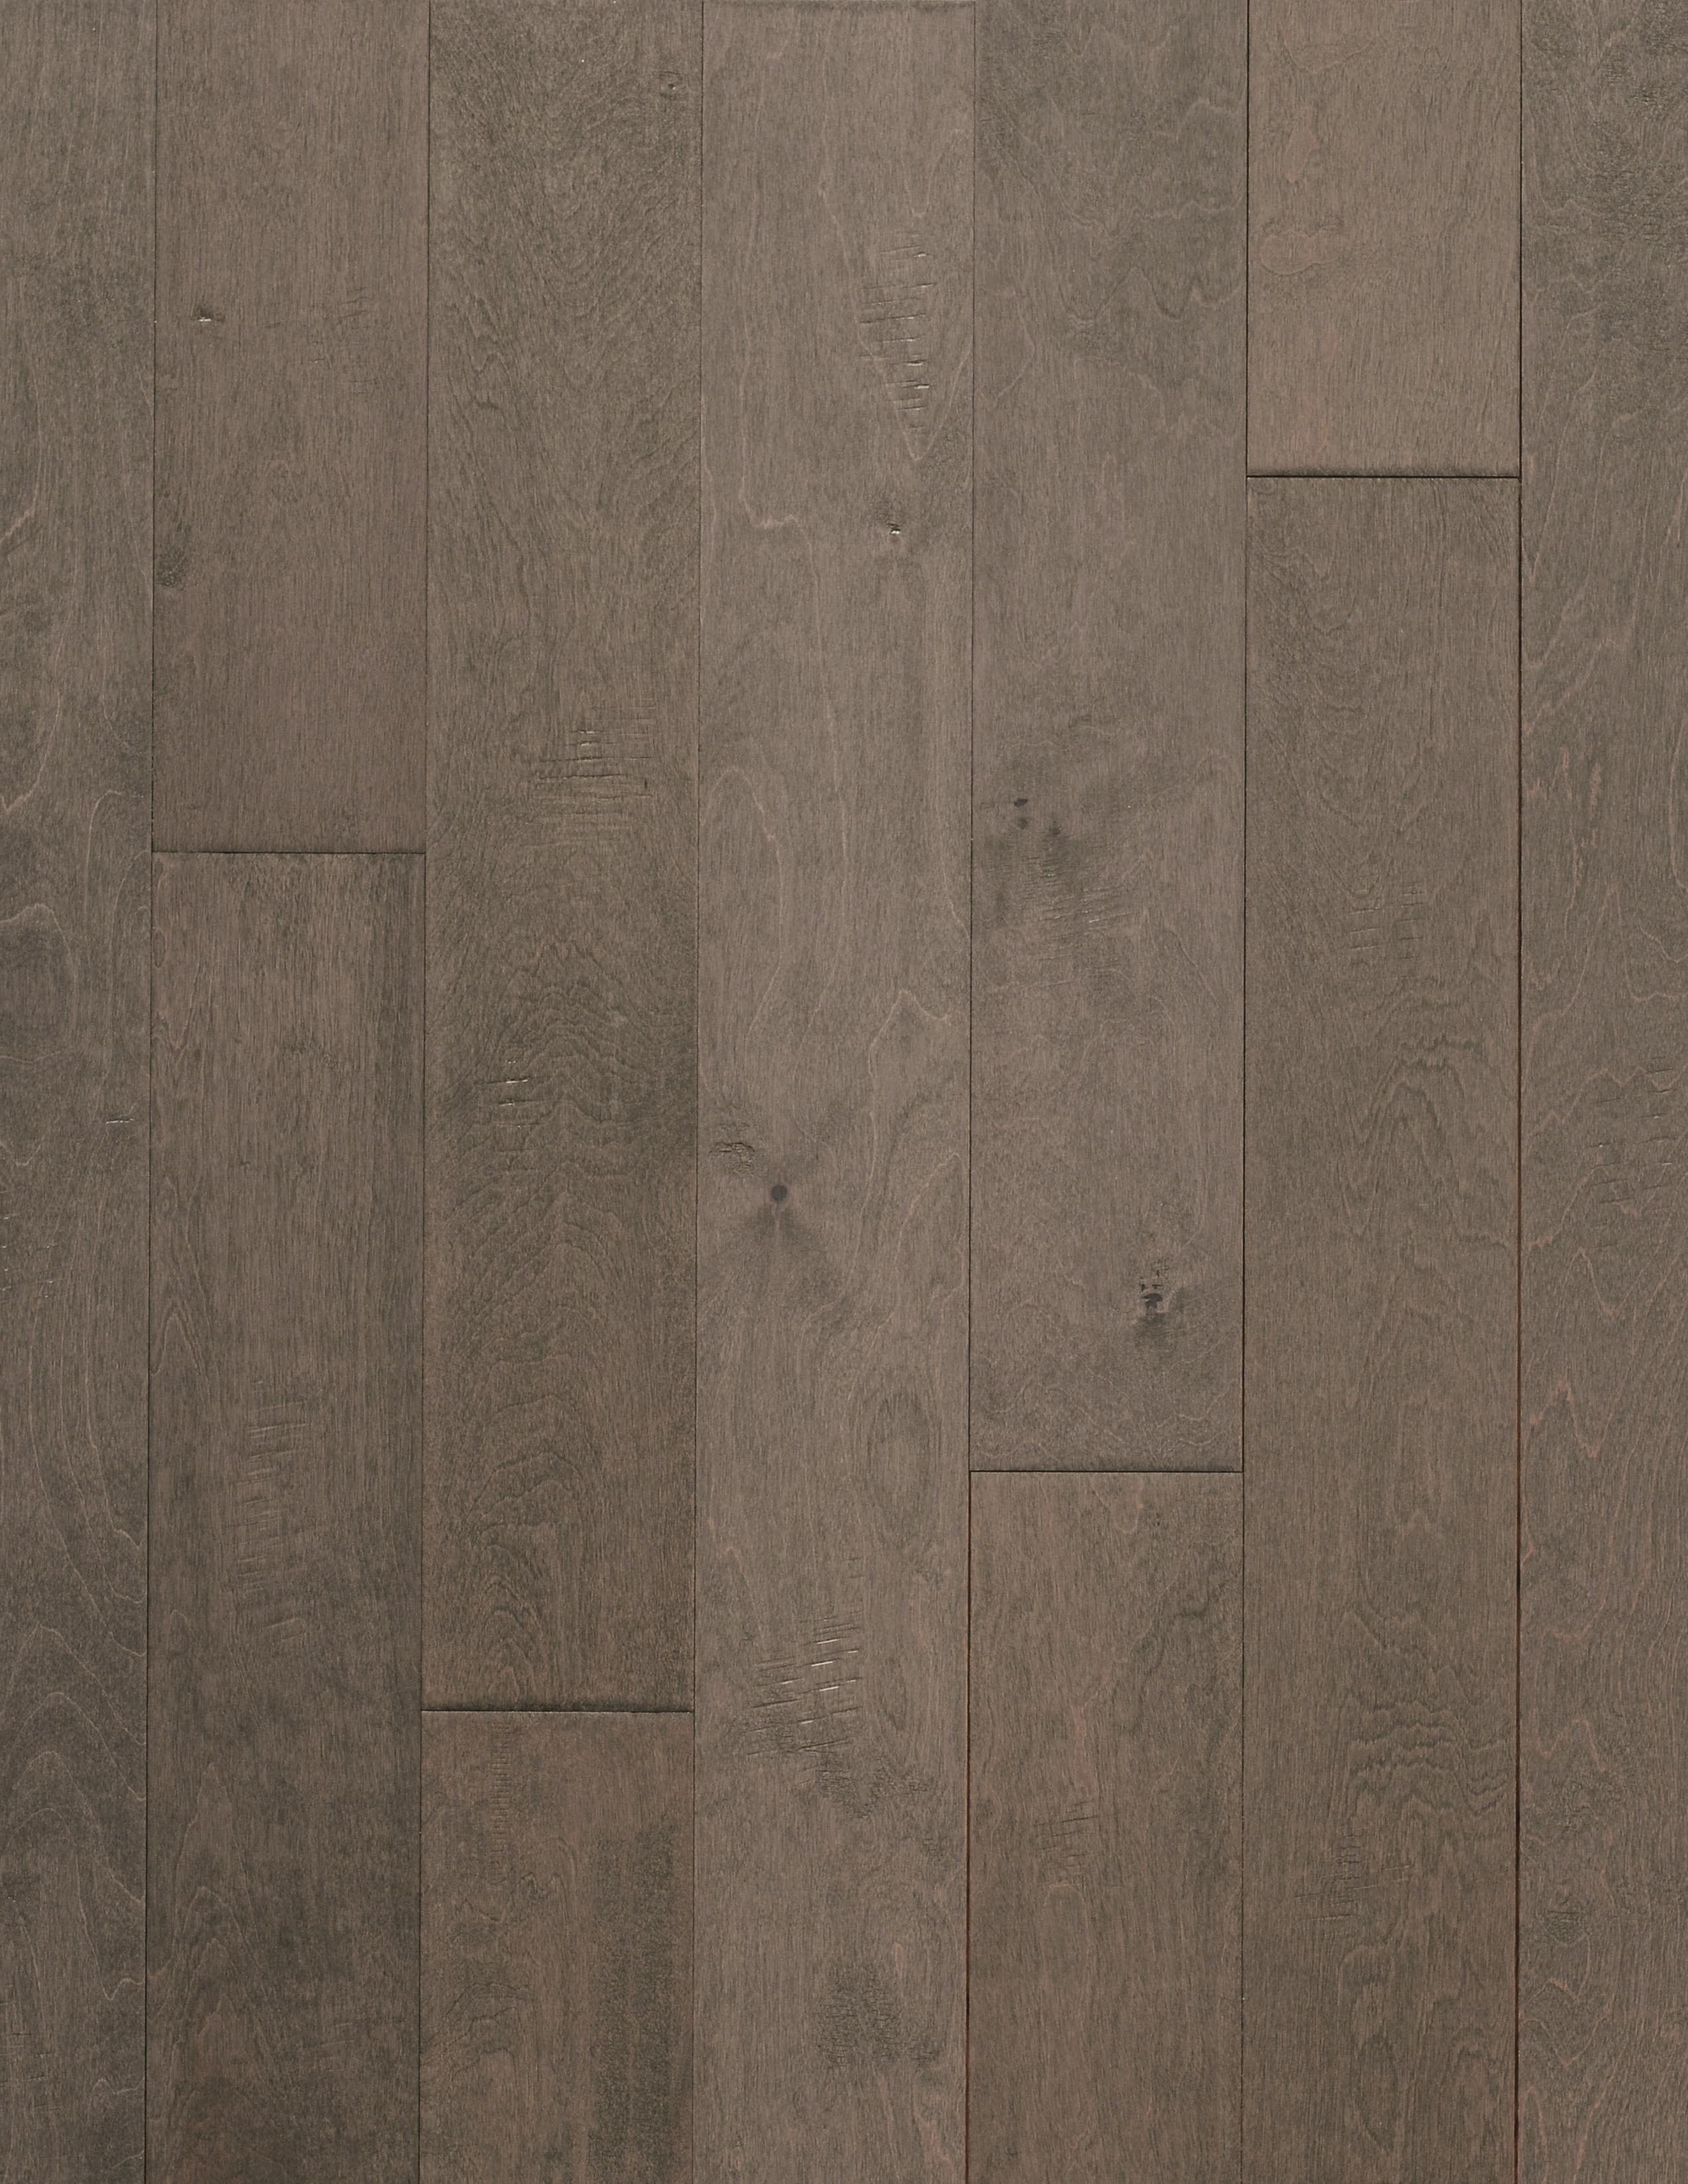 "Jamaica / Birch / 9 Coats UV Aluminum Oxide / ABCDE / 3/8"" x 5"" x R.L Big Ass Wood Floors - New York Collection 0"